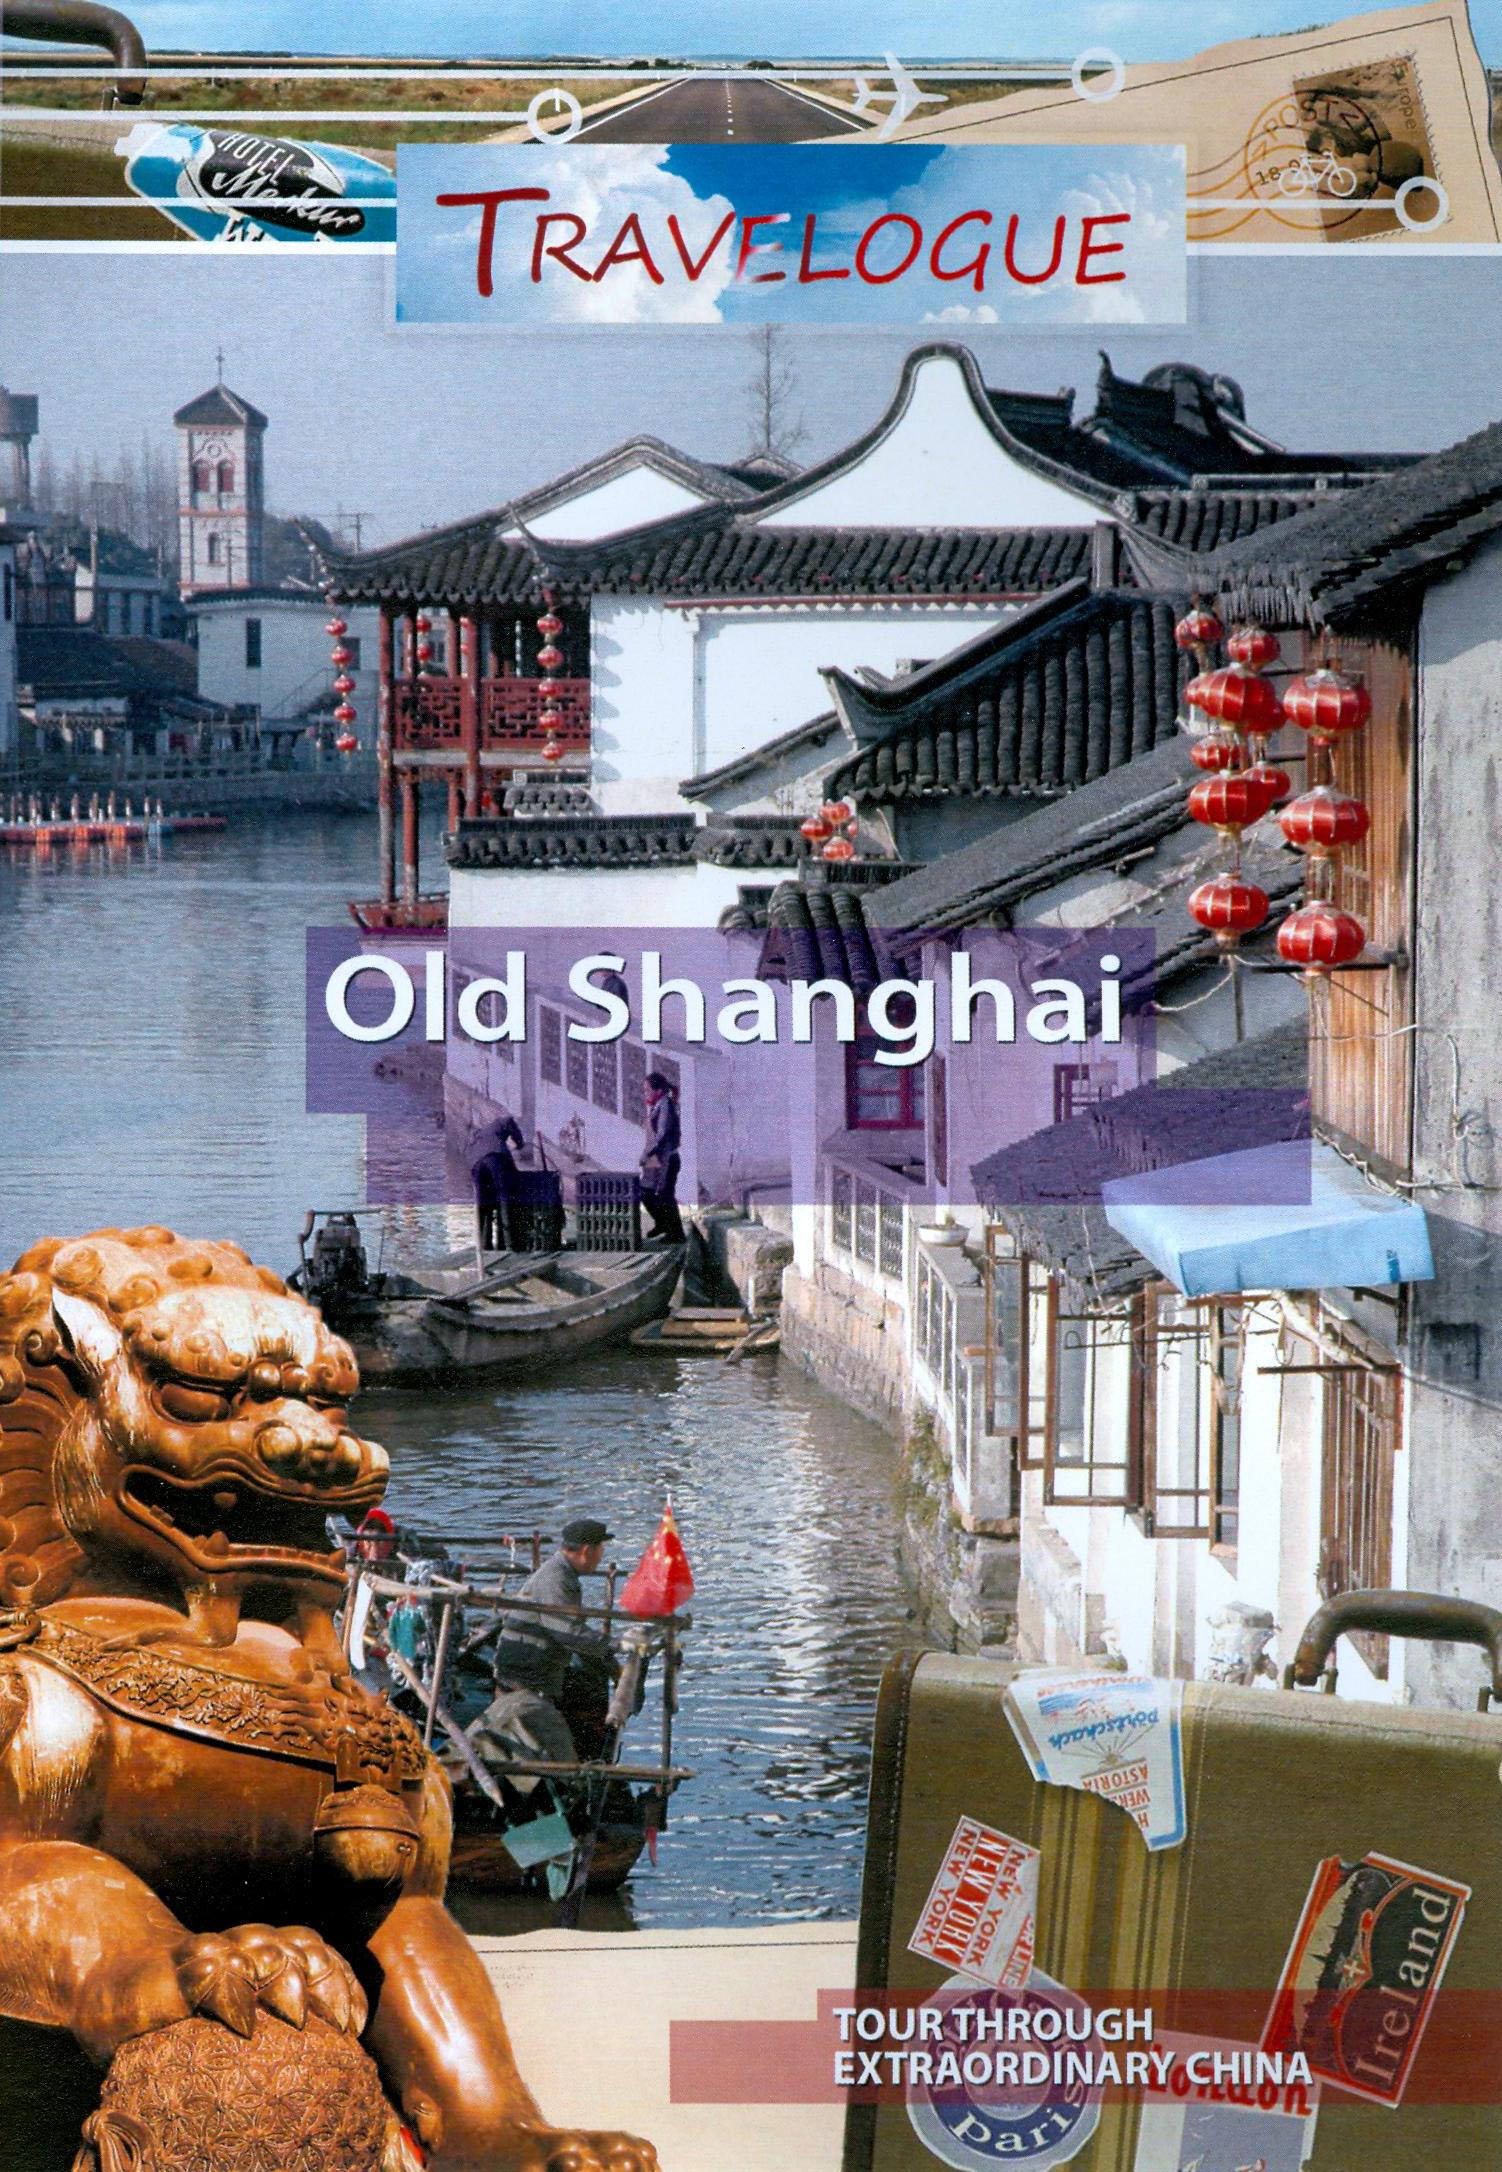 Travelogue 198: Old Shanghai